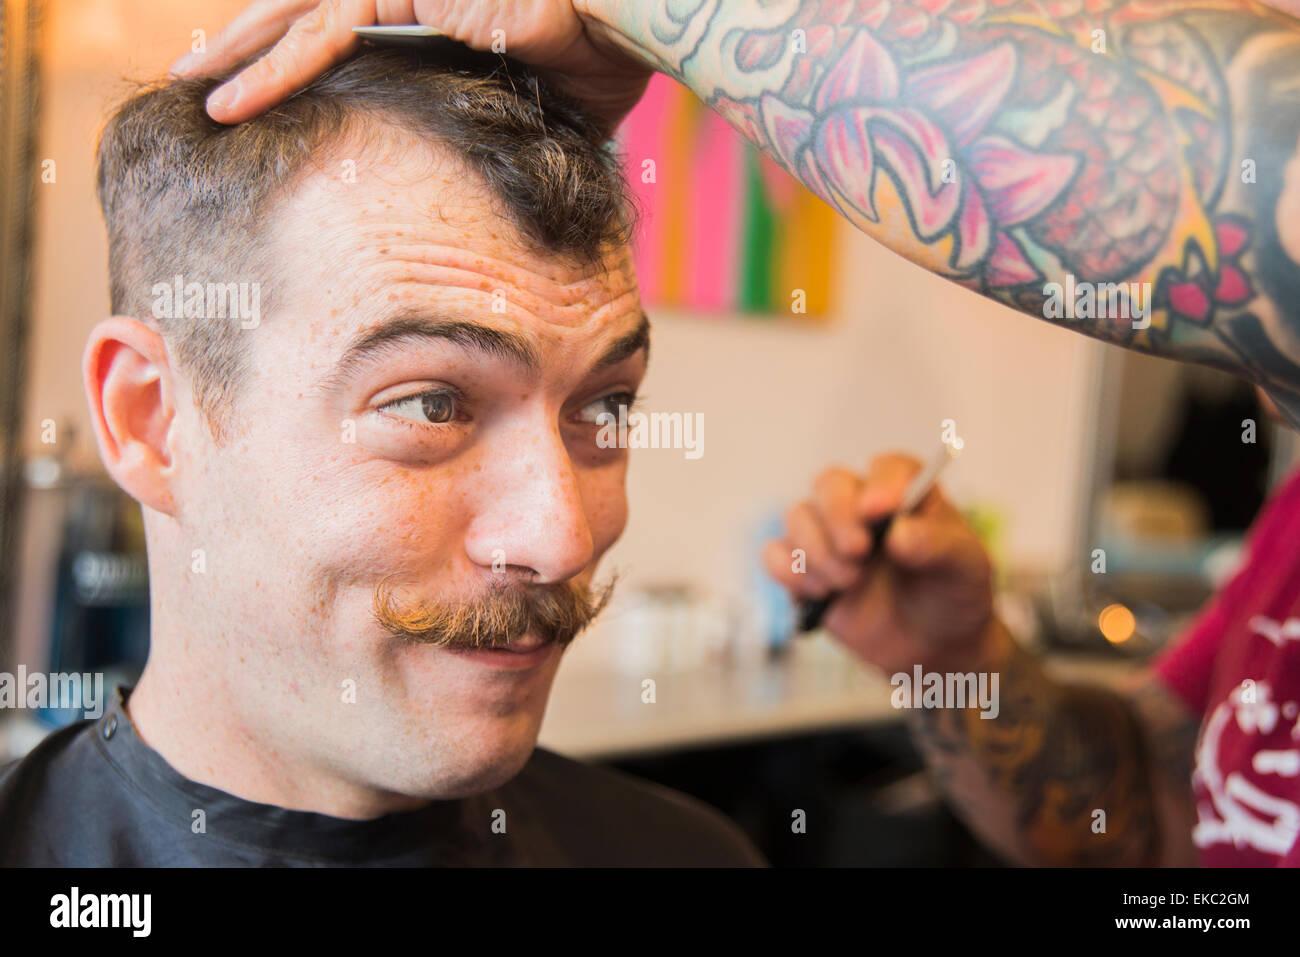 Young man having his hair cut - Stock Image